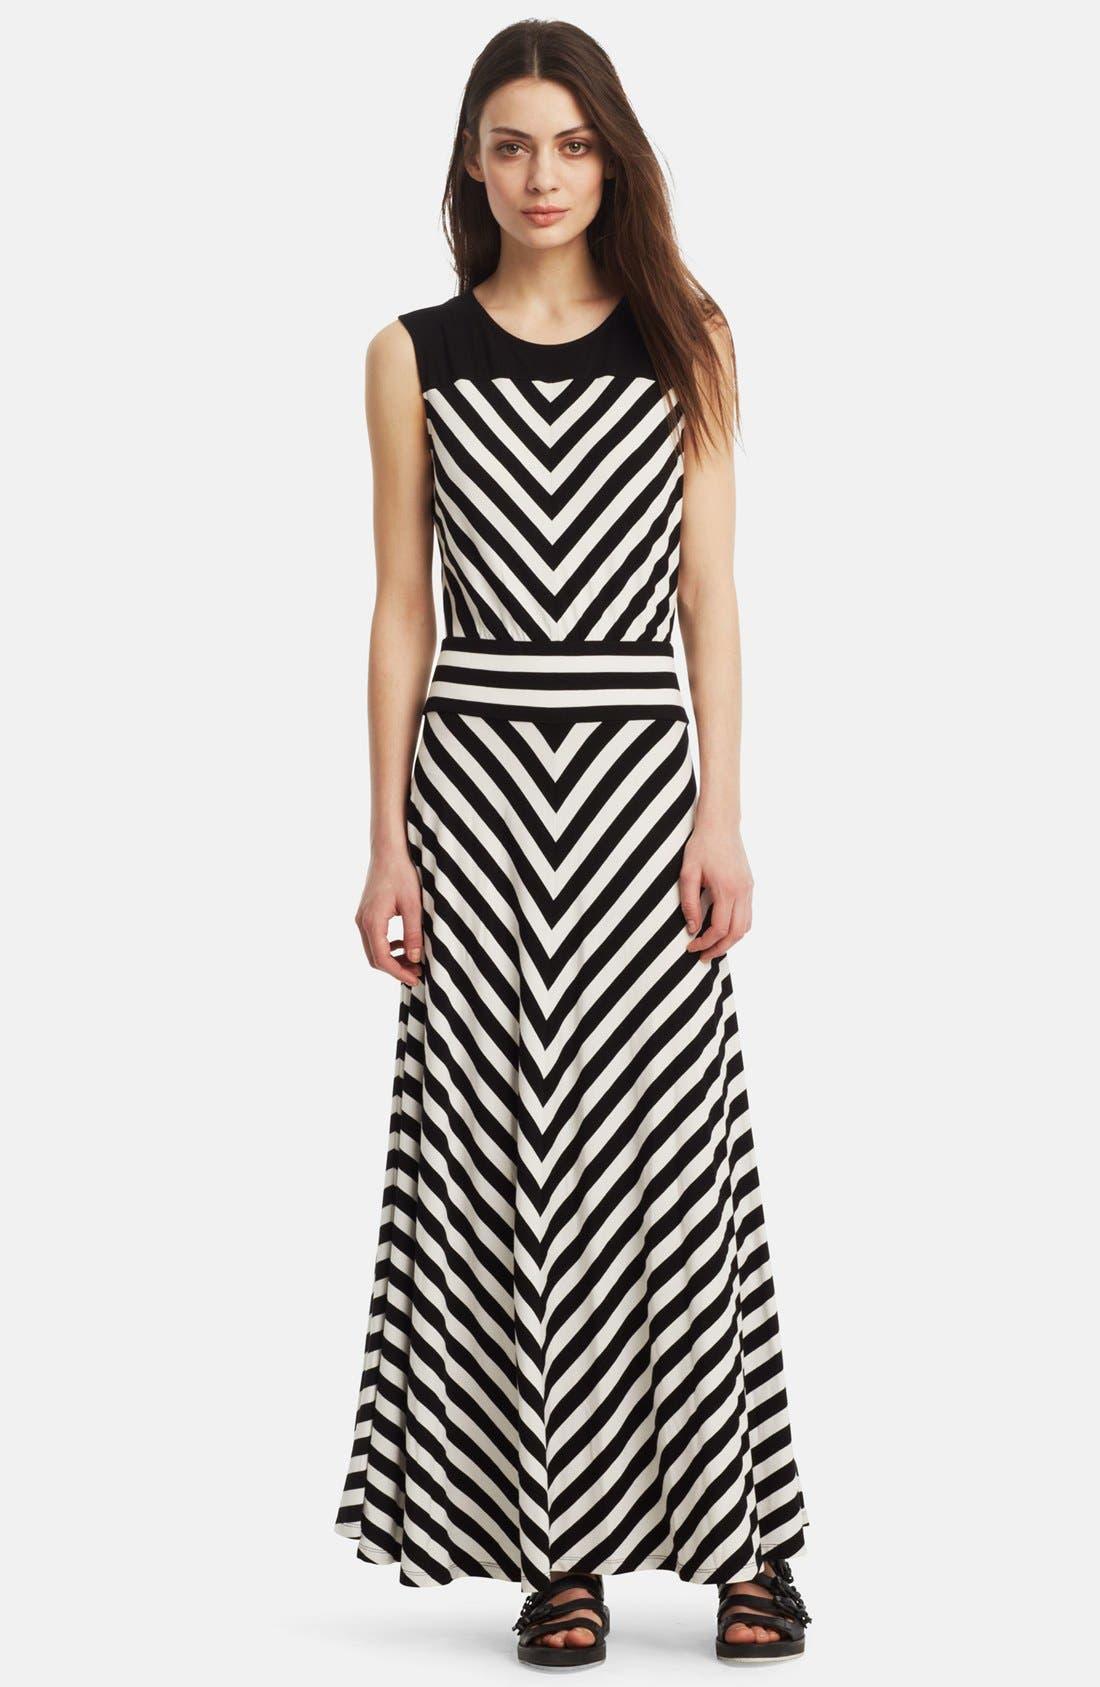 Main Image - Kenneth Cole New York 'Harmony' Maxi Dress